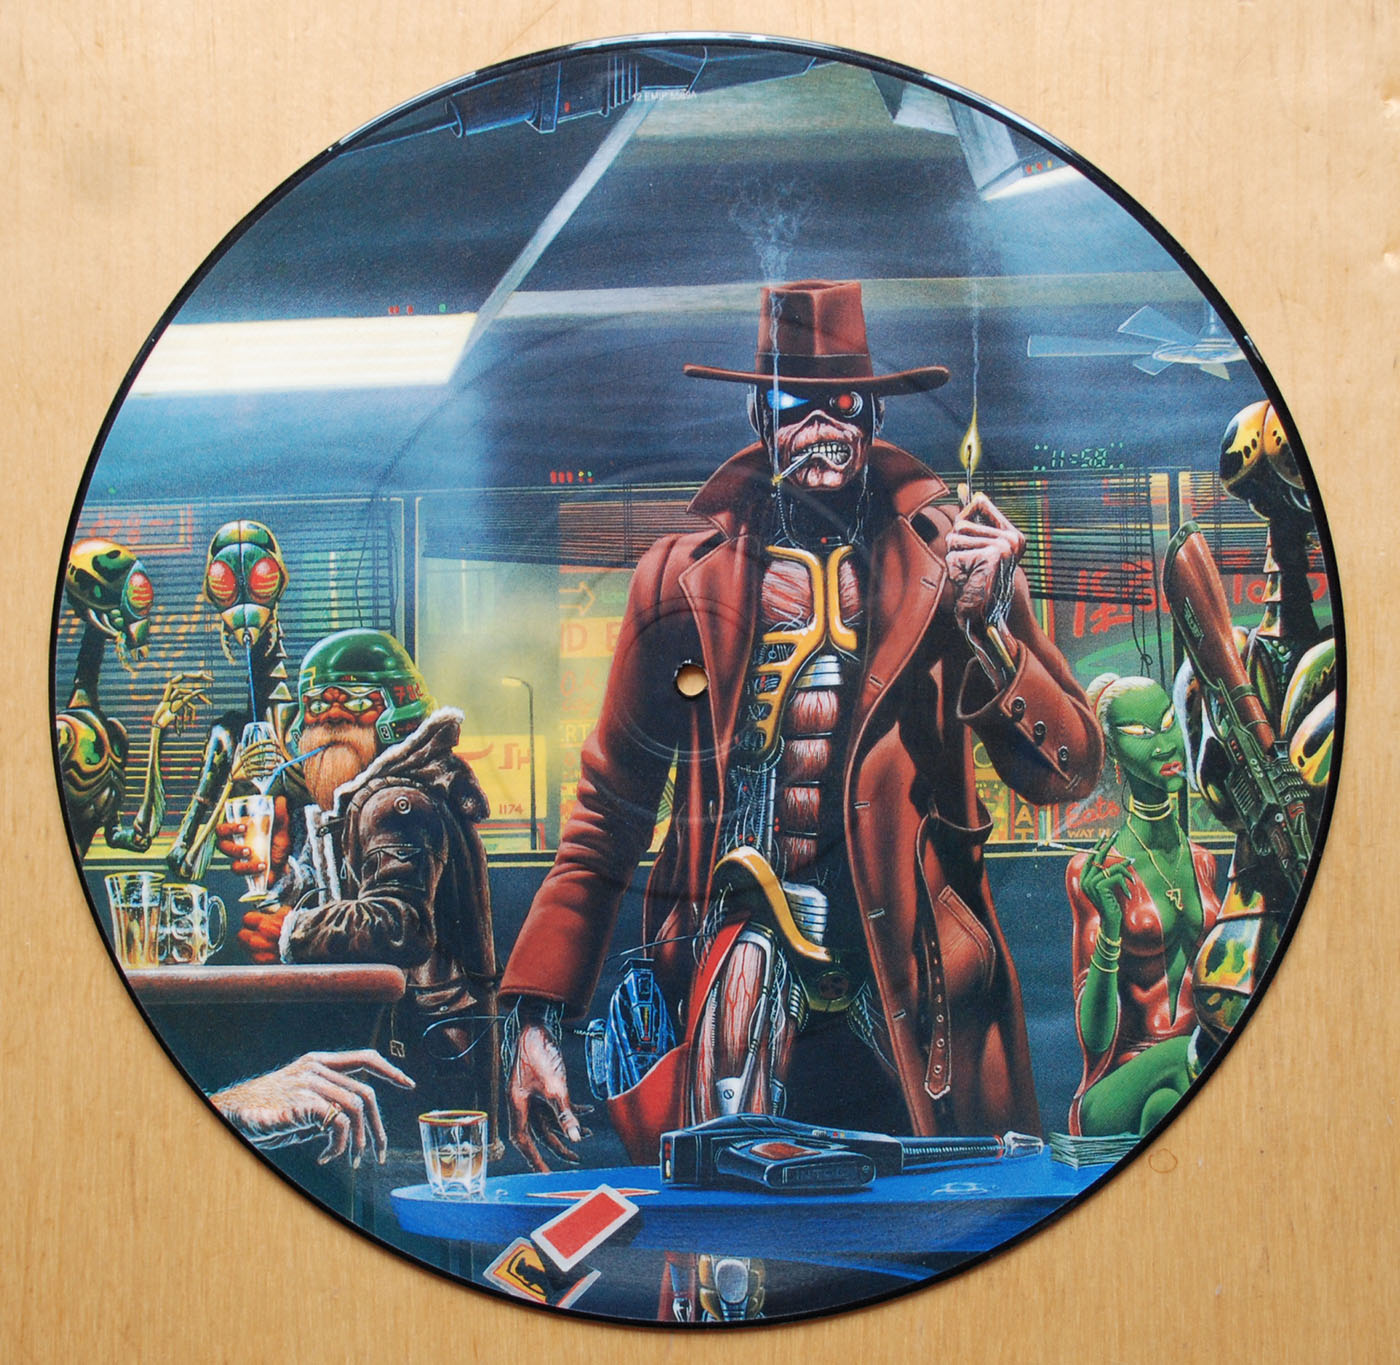 Vinyl Artwork Arcade